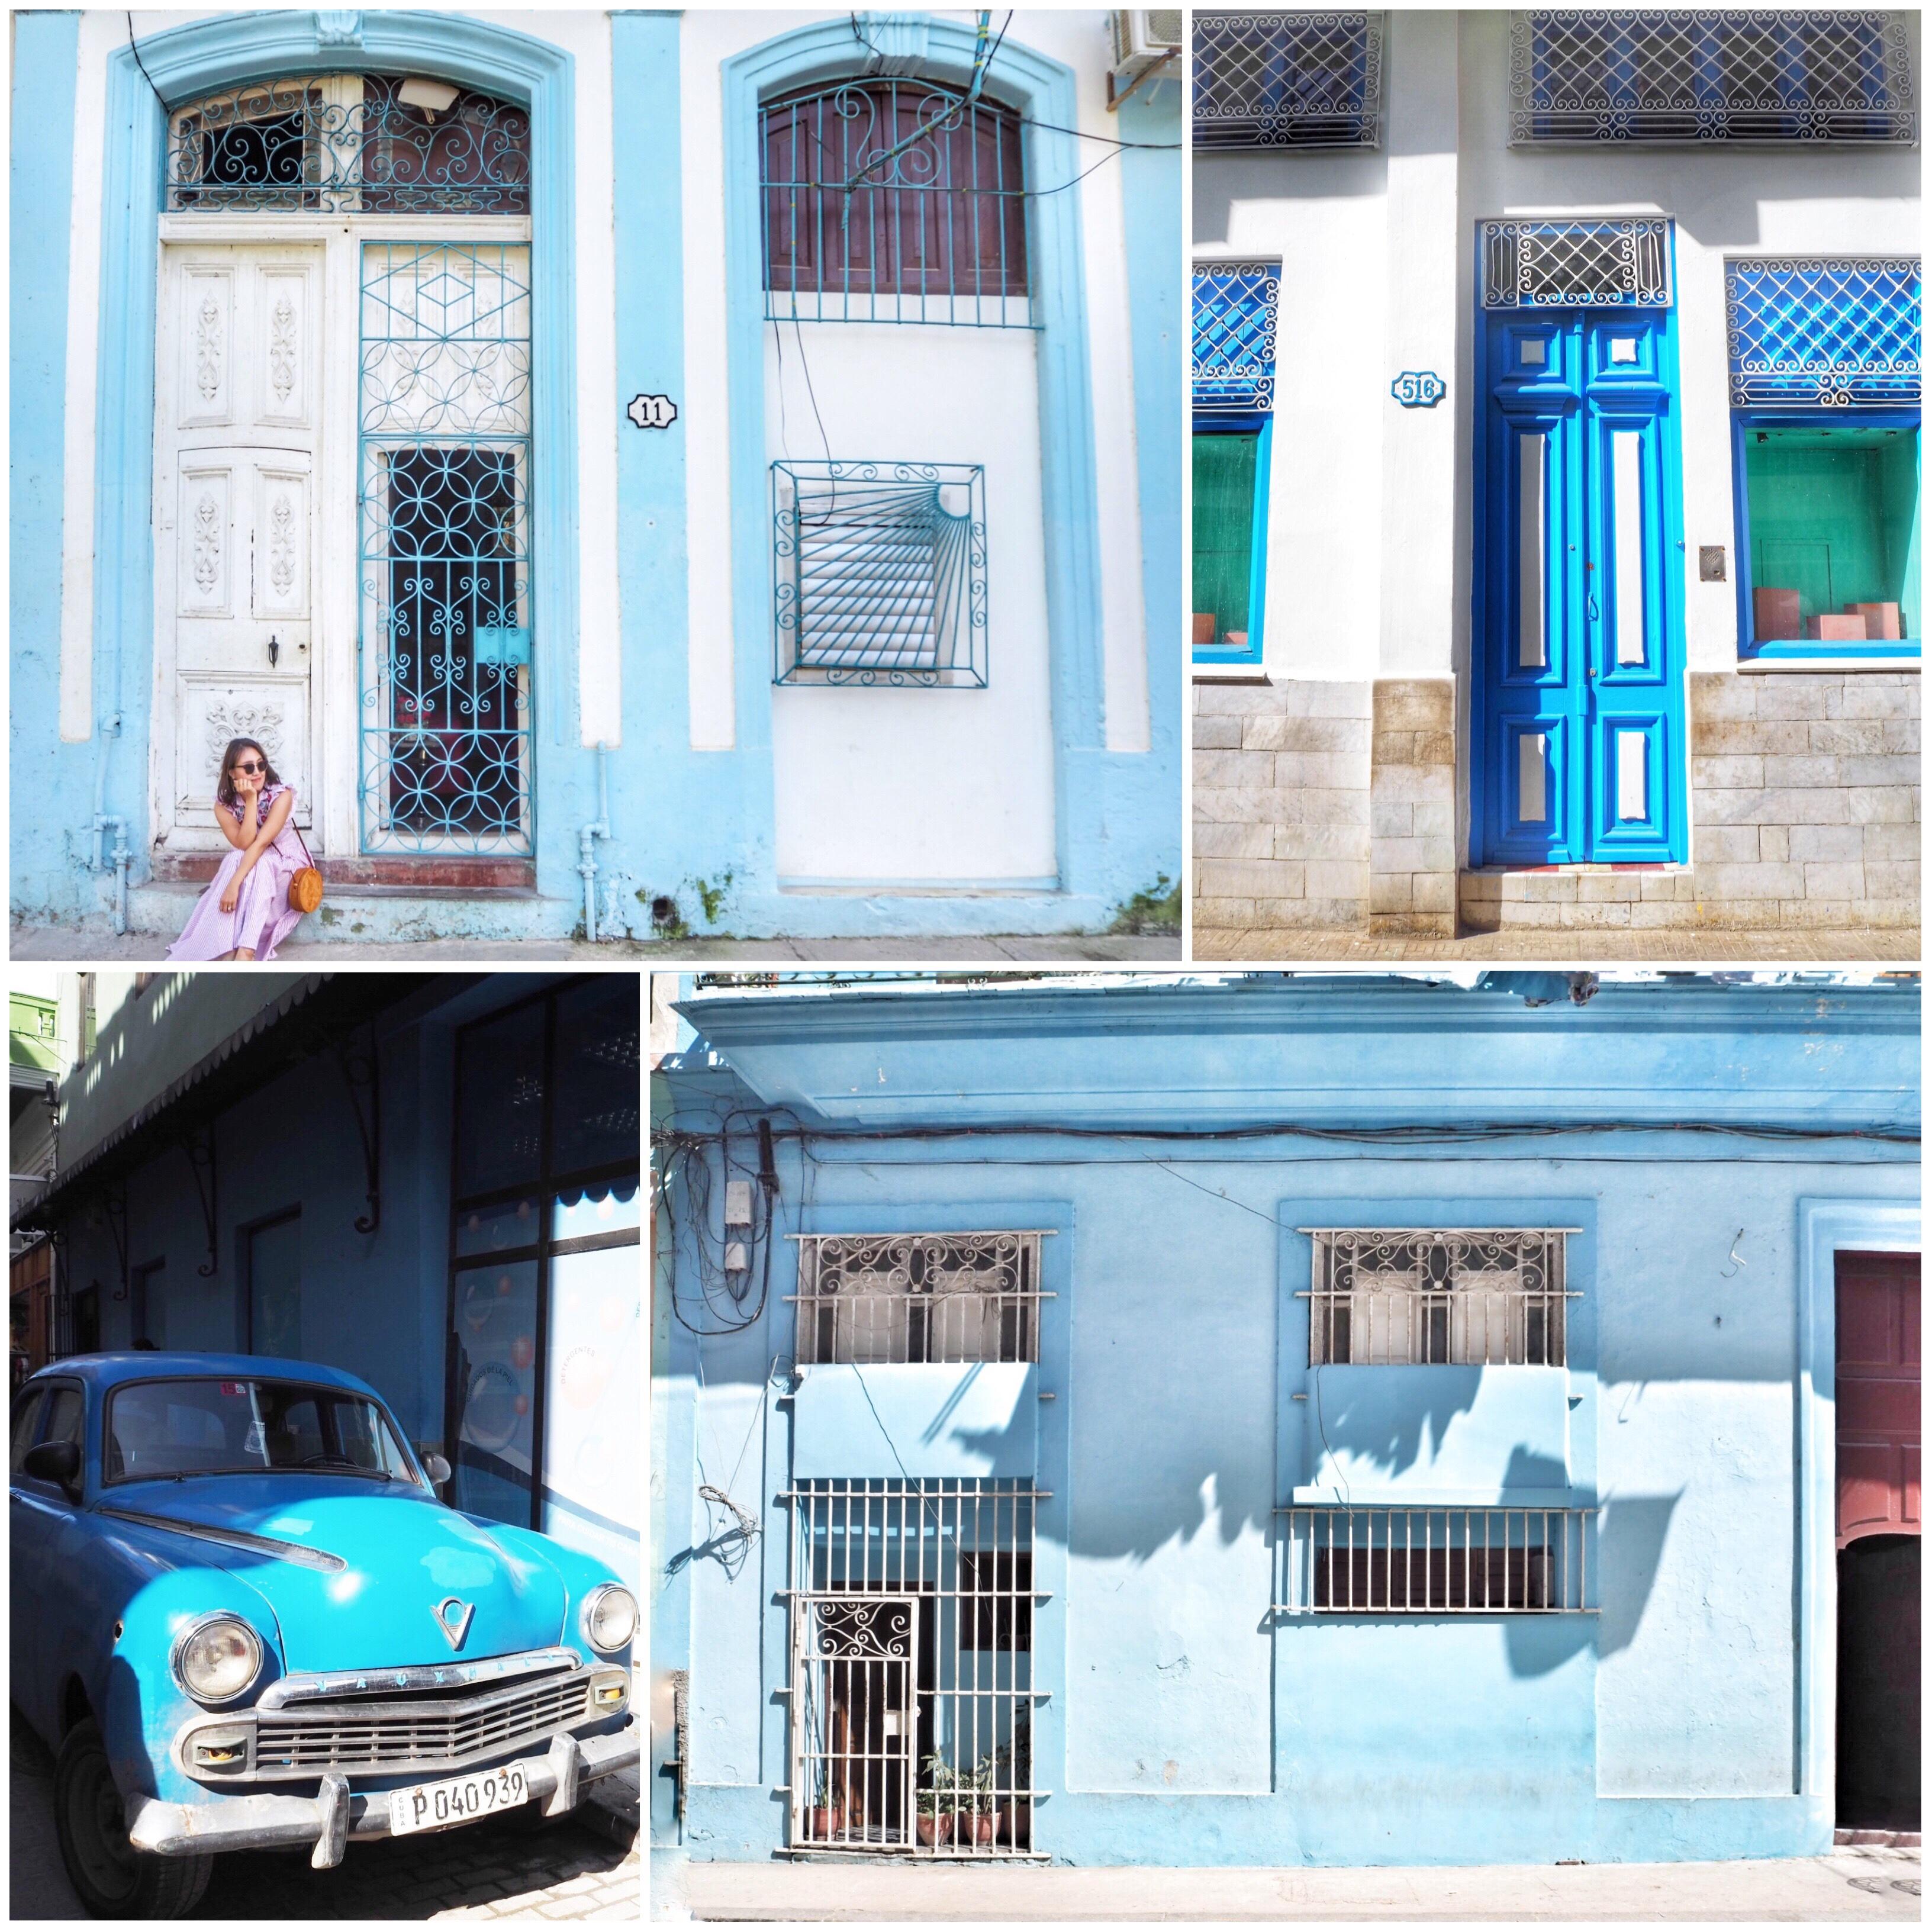 img 6741 - Old Habana - 街全体が世界遺産 色が溢れるハバナ旧市街散歩で出会った風景